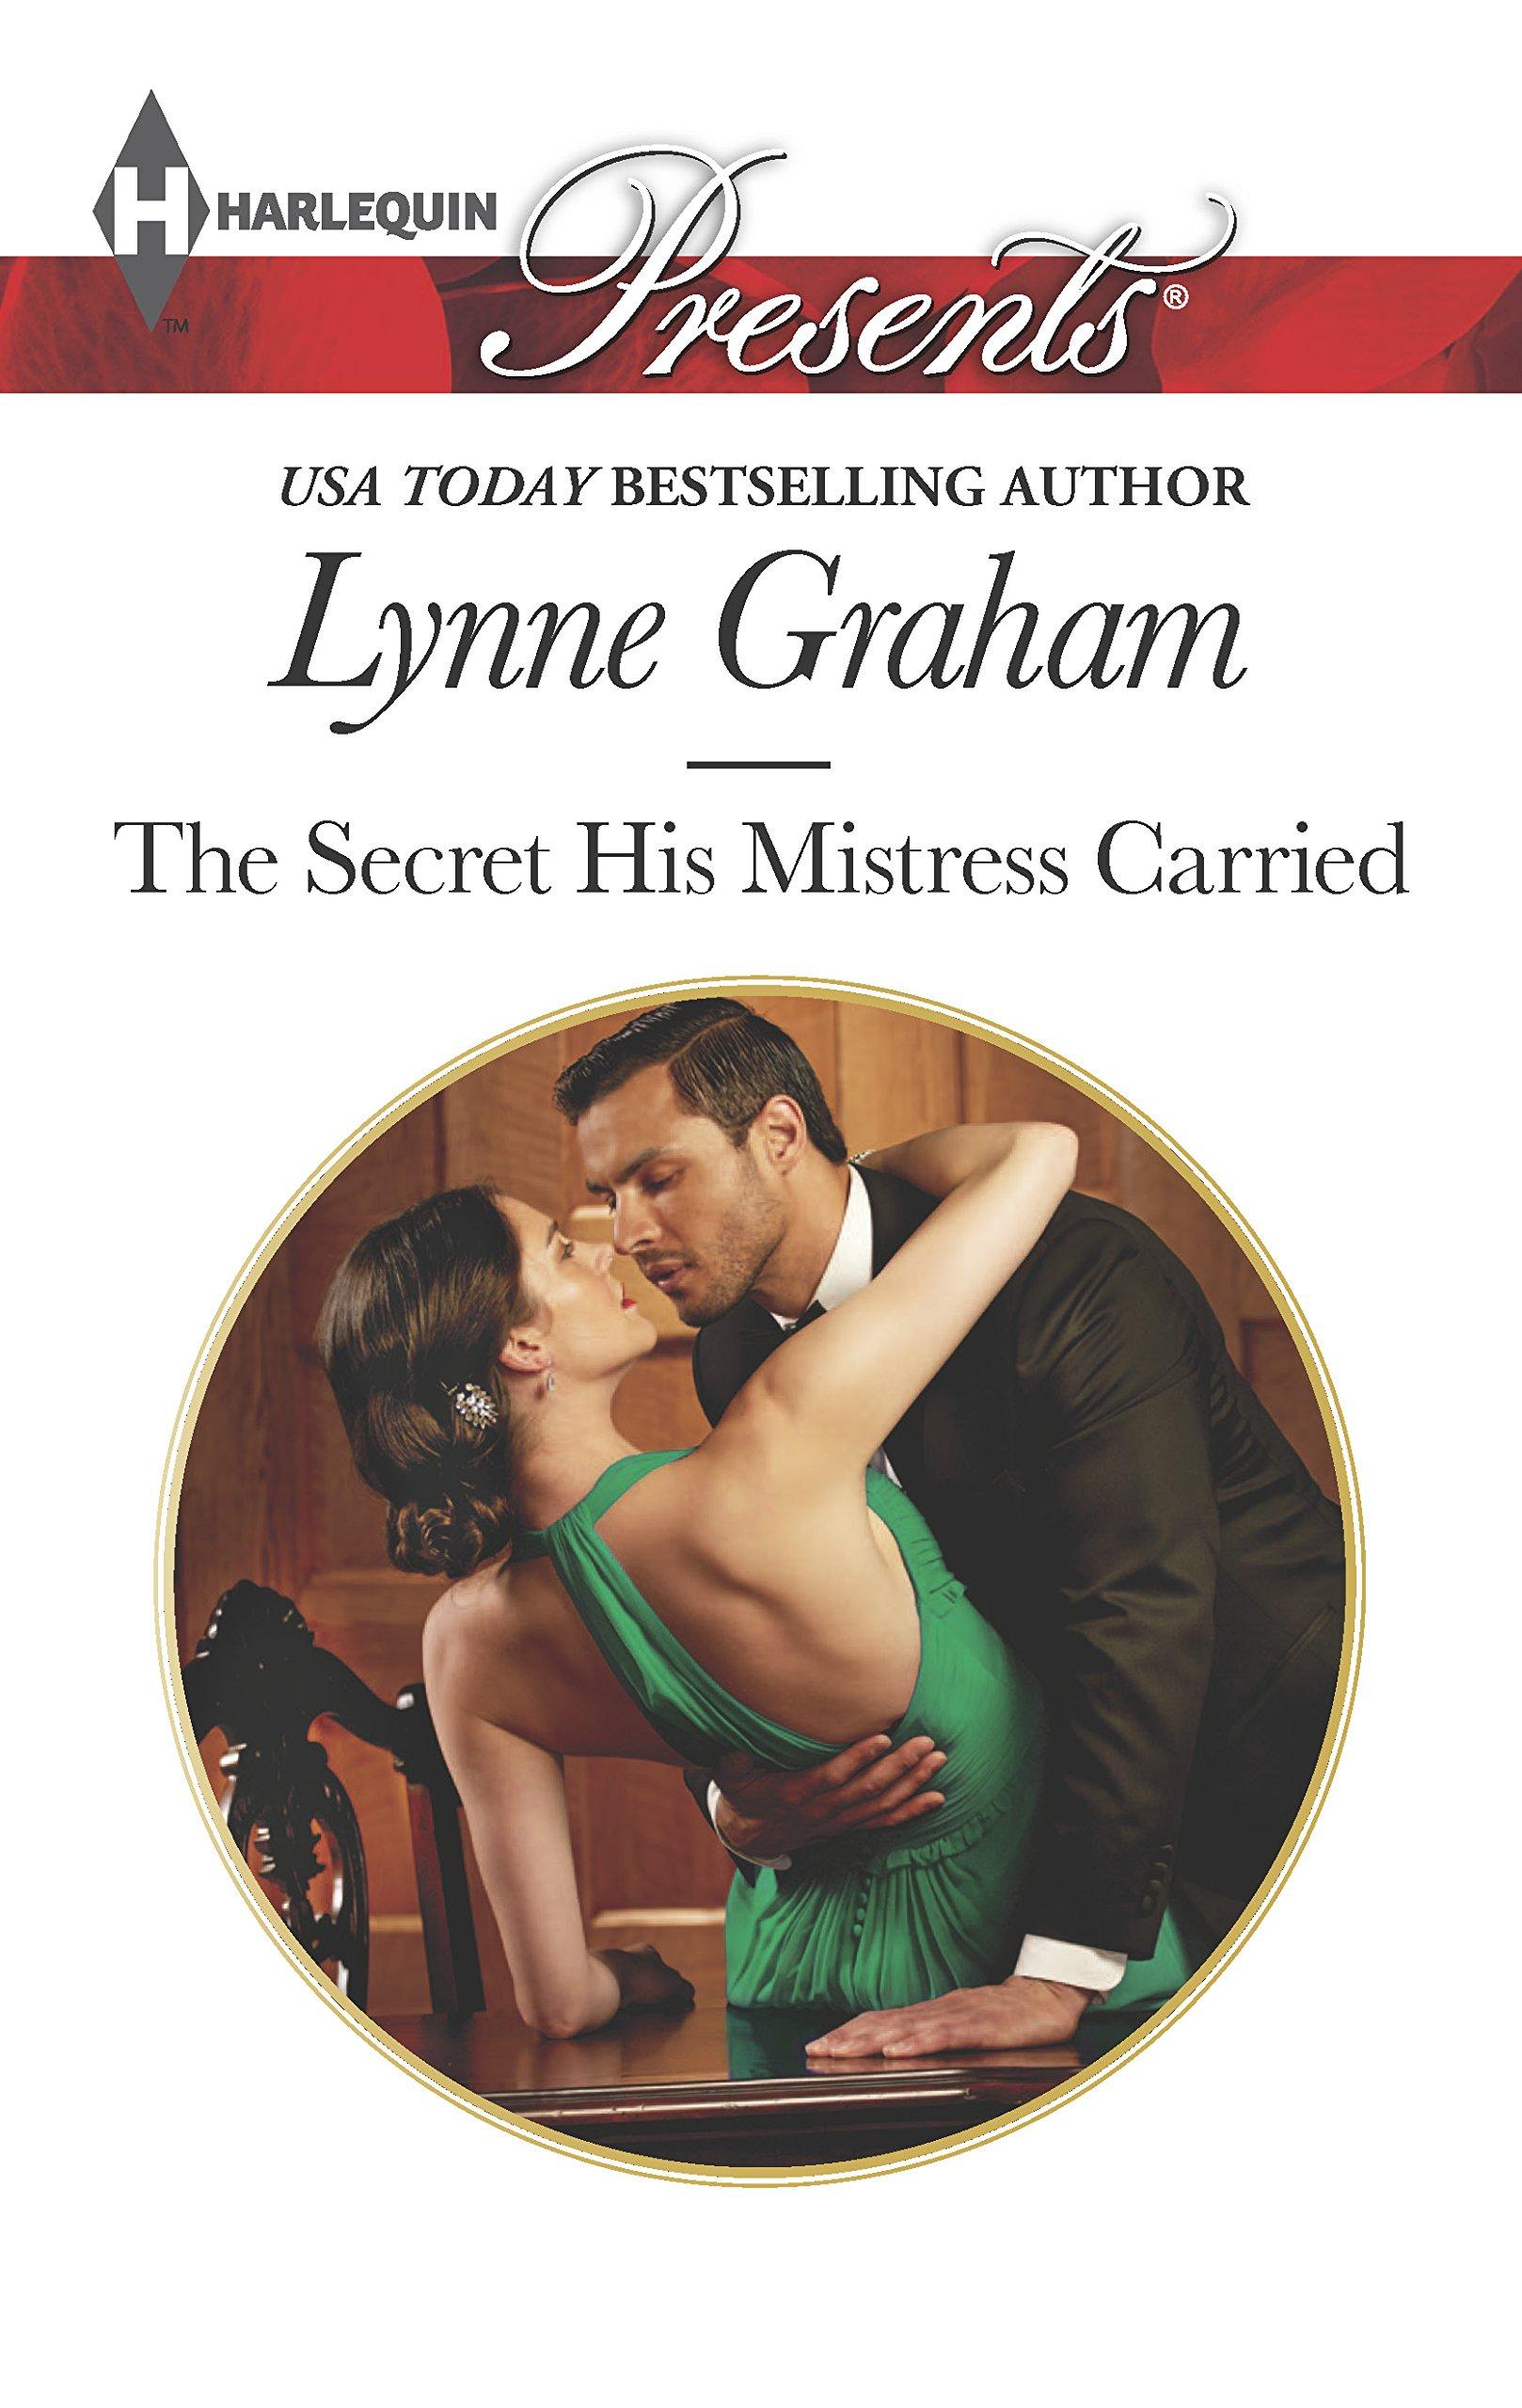 The Secret His Mistress Carried (Harlequin Presents) pdf